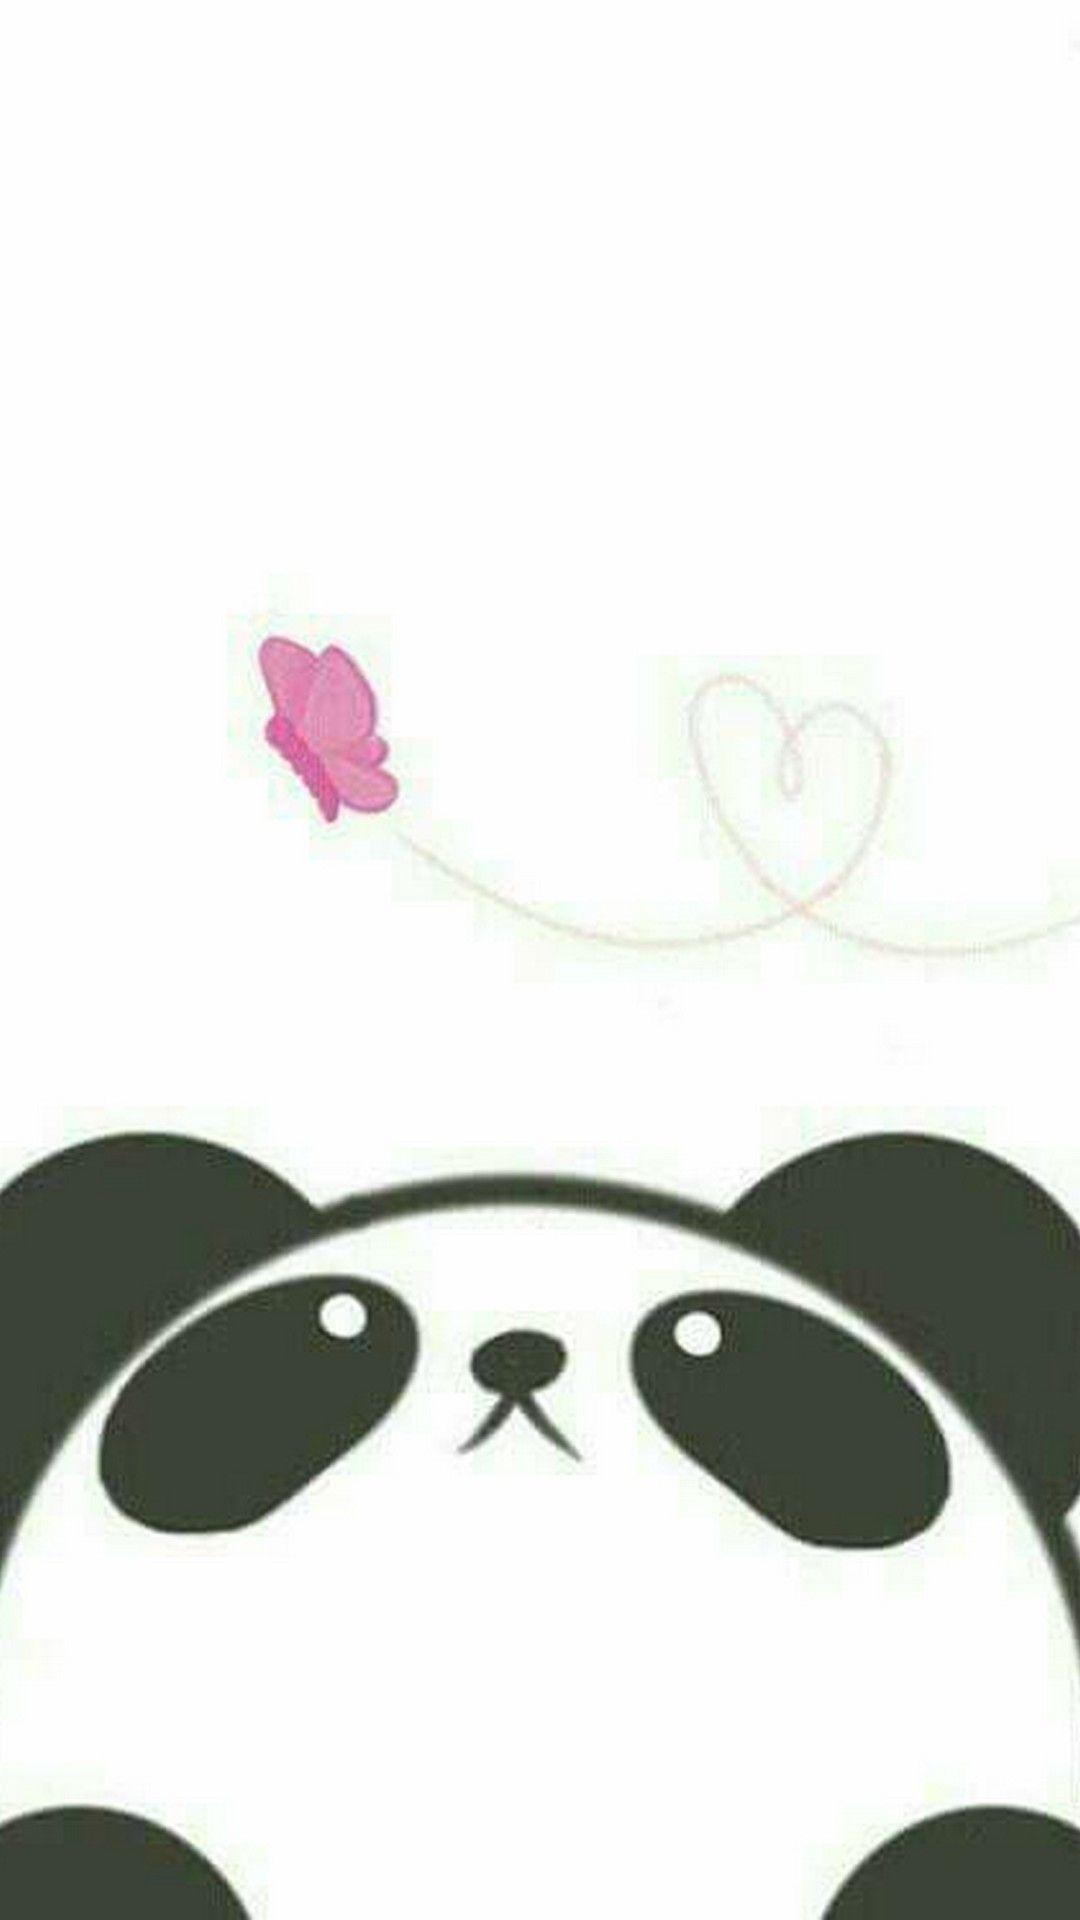 Panda Mobile Wallpaper Hd Best Hd Wallpapers Cute Panda Wallpaper Cute Wallpapers Hd Cute Wallpapers